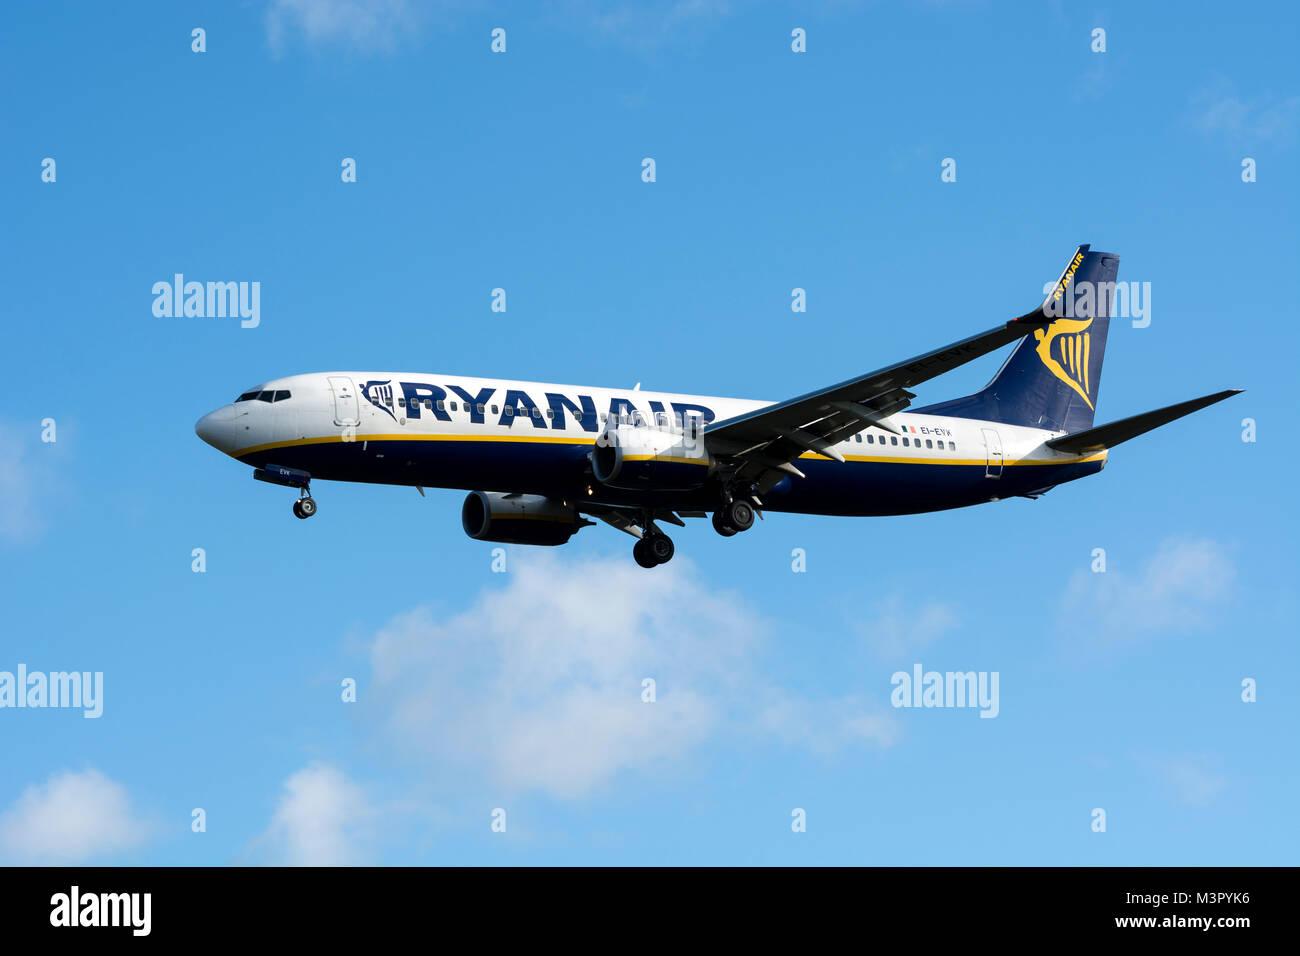 Ryanair Boeing 737 approaching Birmingham Airport, UK (EI-EVK) - Stock Image